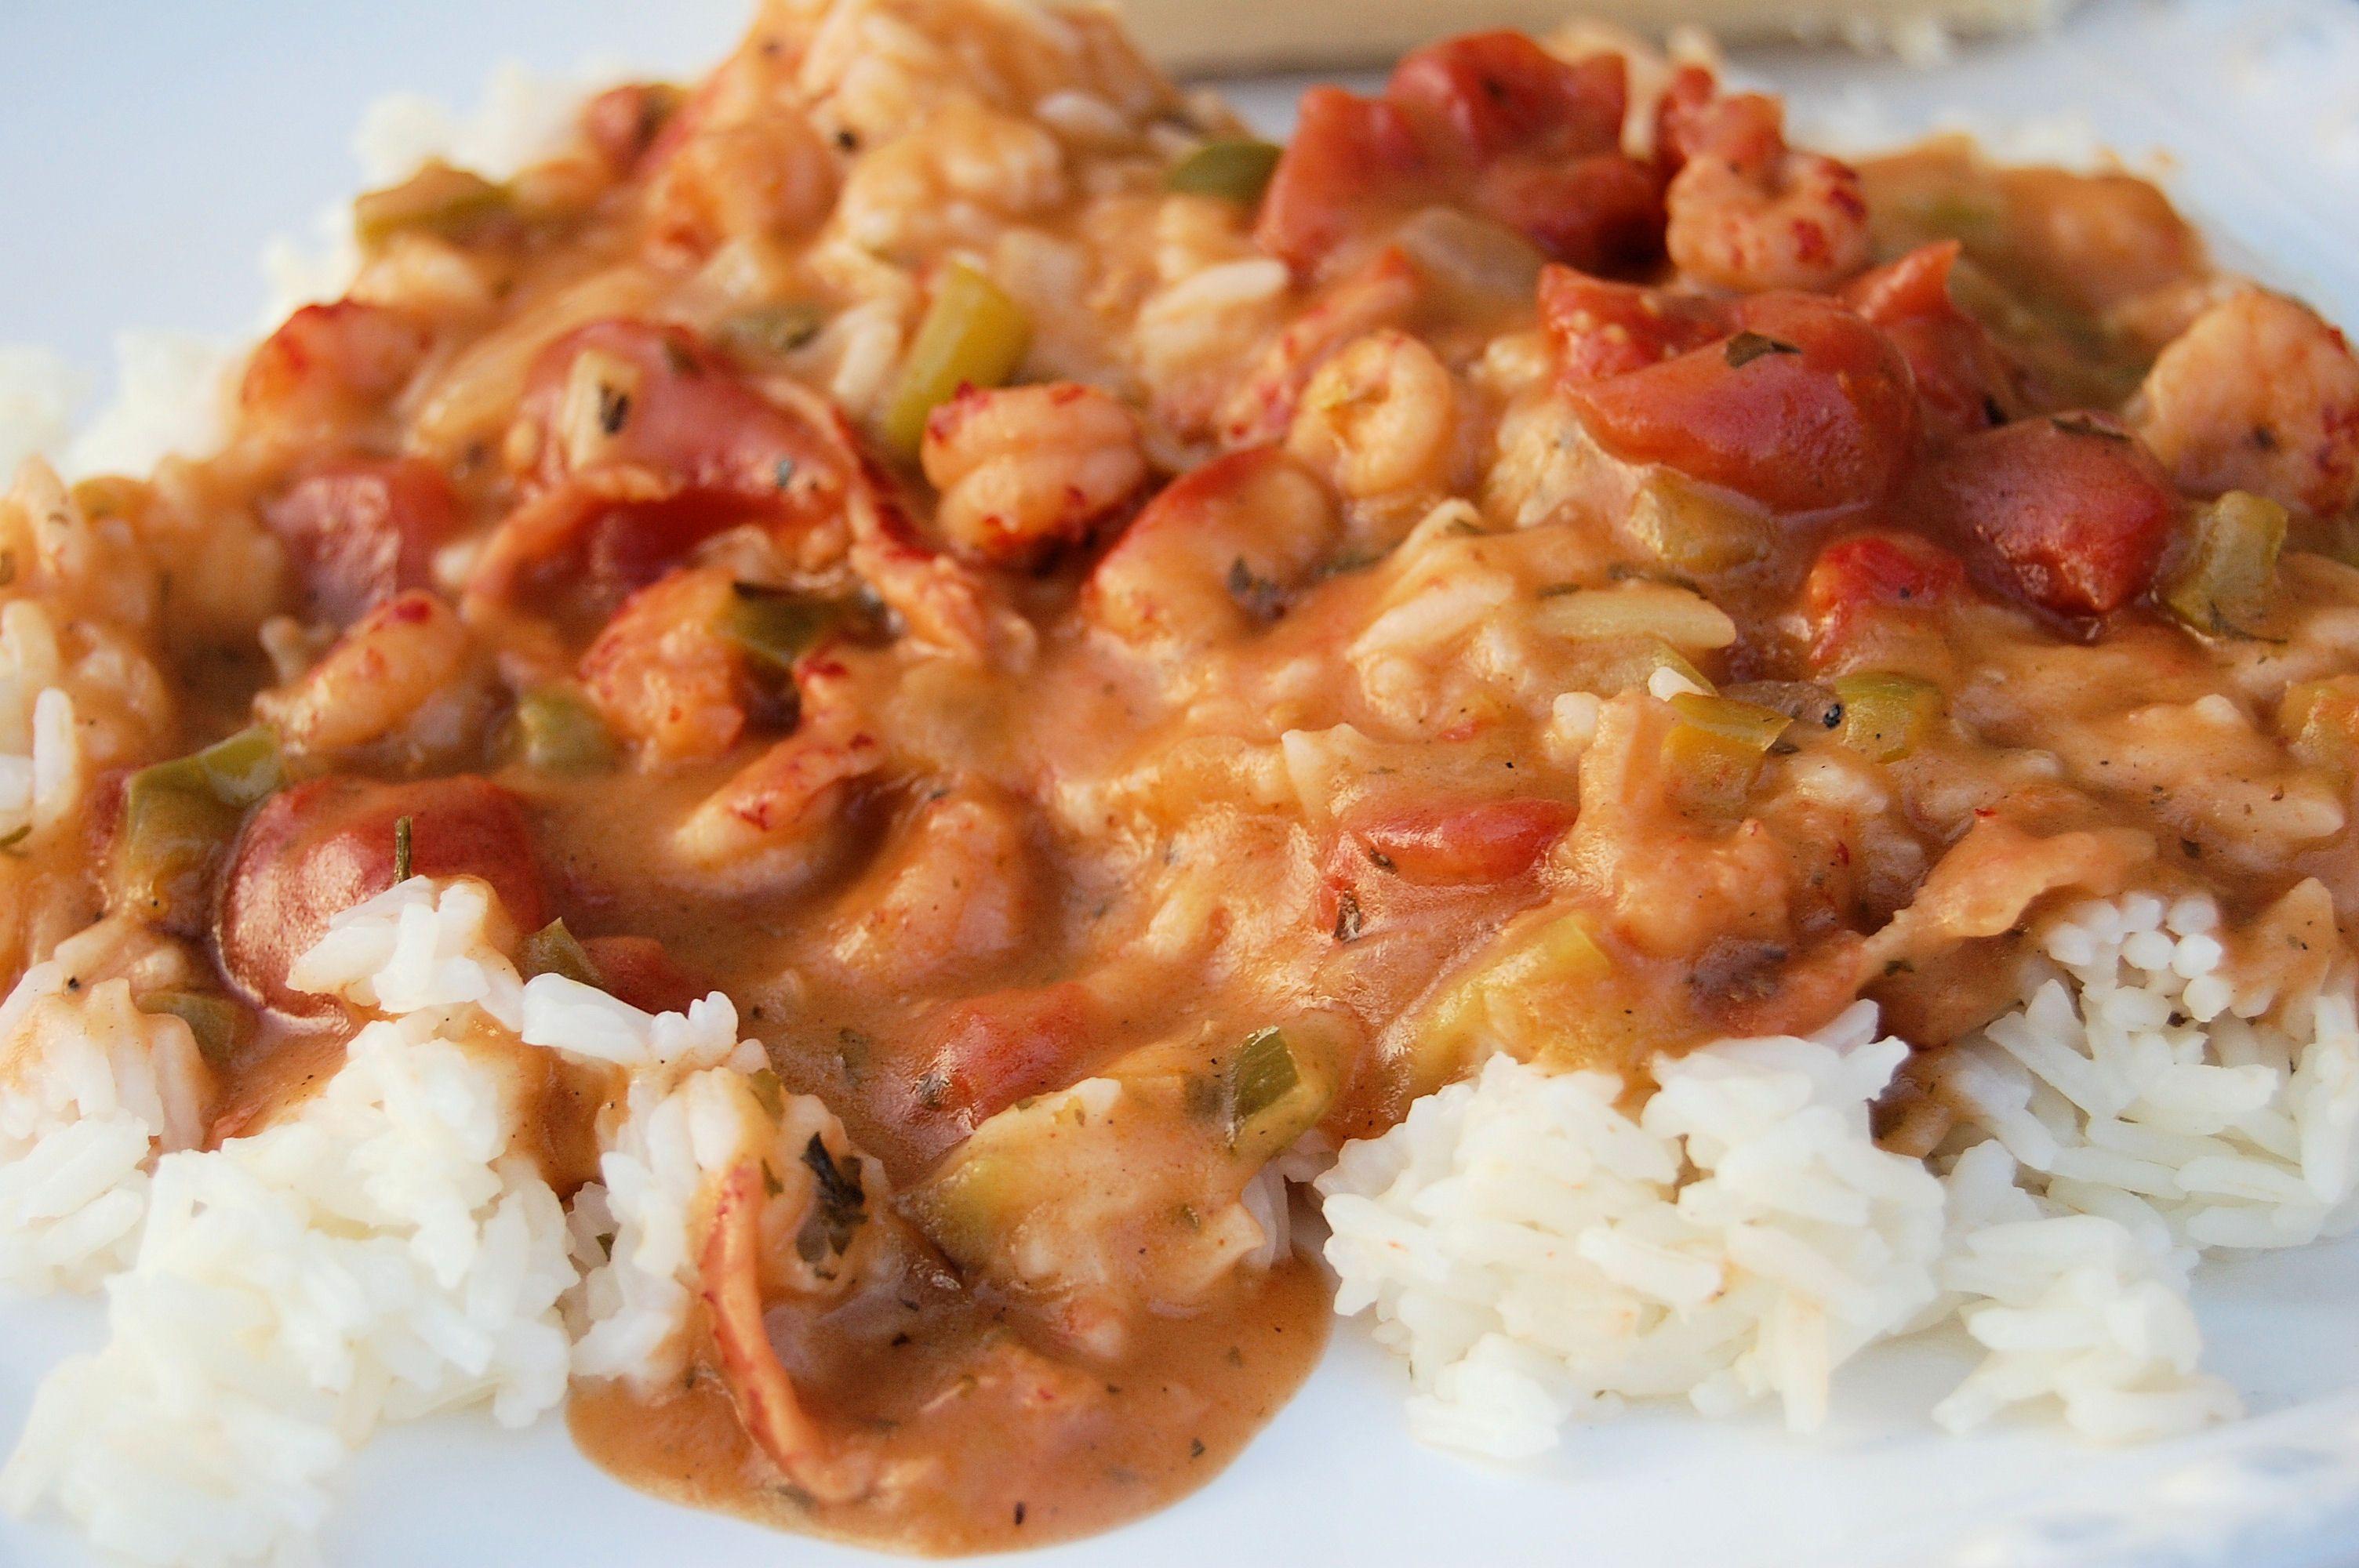 The Best Crawfish Etouffee Ever Recipe Crawfish Etoufee Recipe Etouffee Recipe Creole Recipes